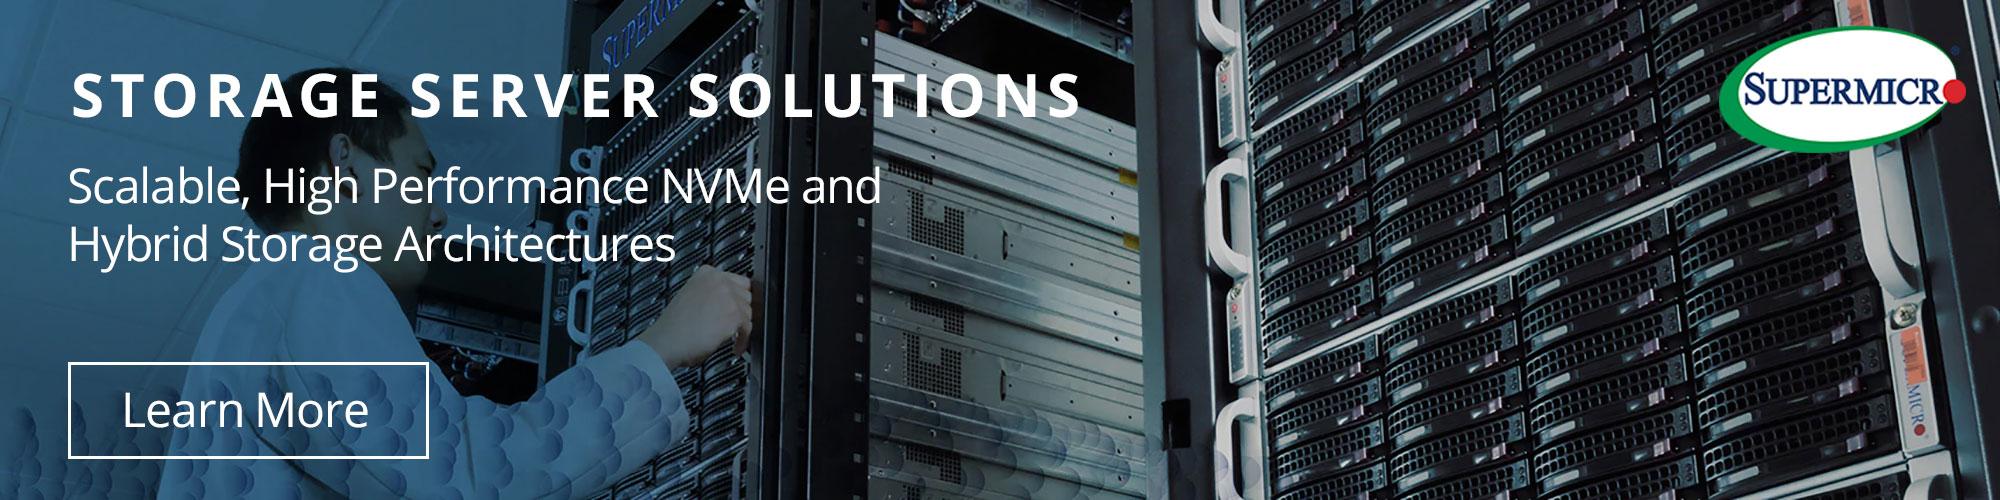 Supermicro Storage Server Solutions